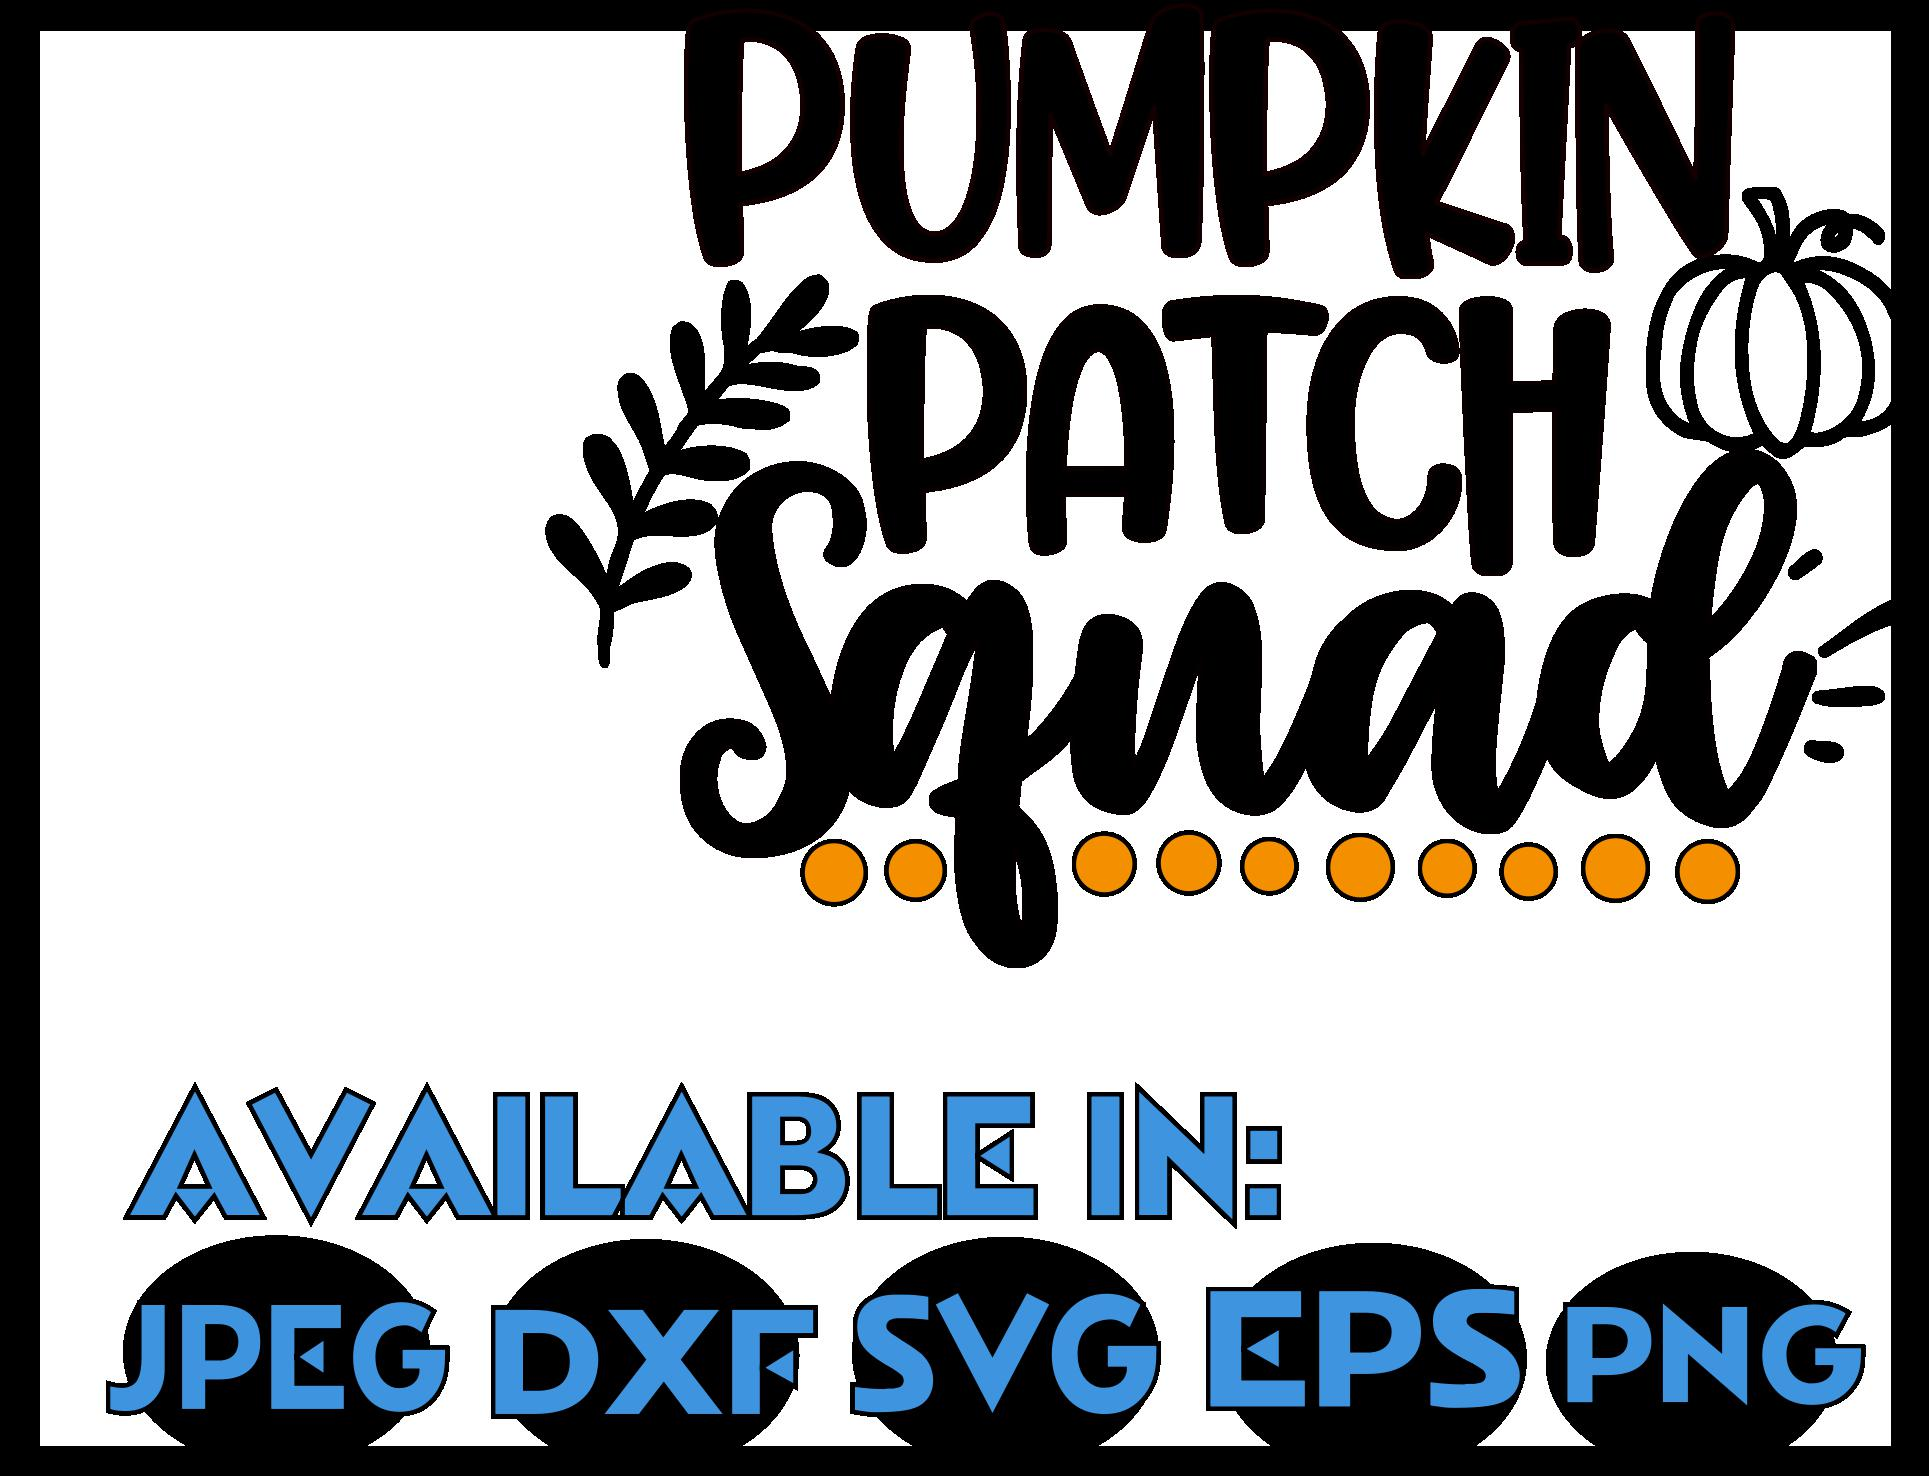 Squad SVG DXF JPEG Silhouette Cricut Halloween pumpkin group example image 3